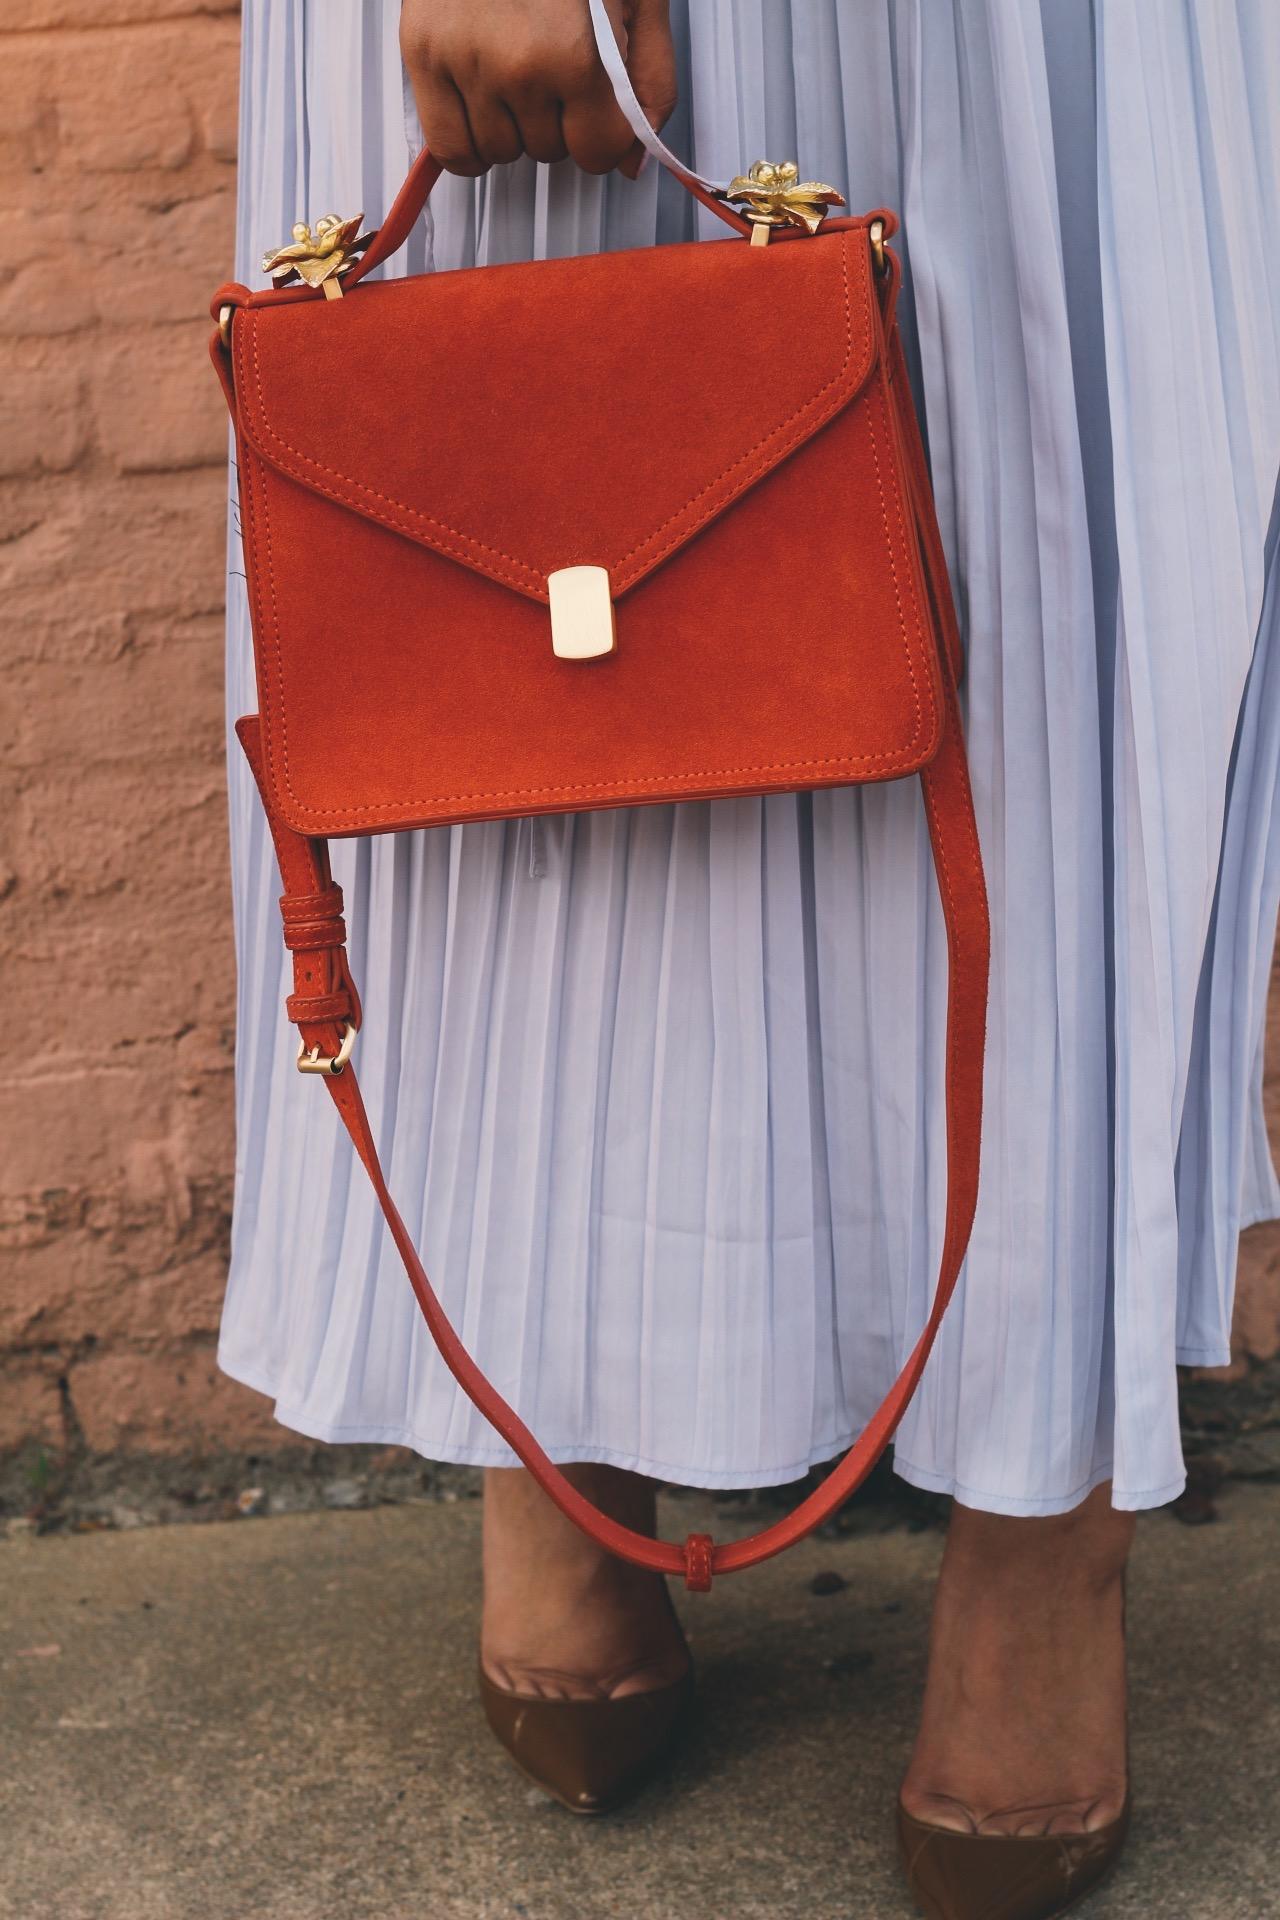 Warehouse-UK-asos-pleated-cold-shoulder-dress-in-lavender-zara-orange-suede-bag-House-of-CB-paris-nude-pumps-14.JPG